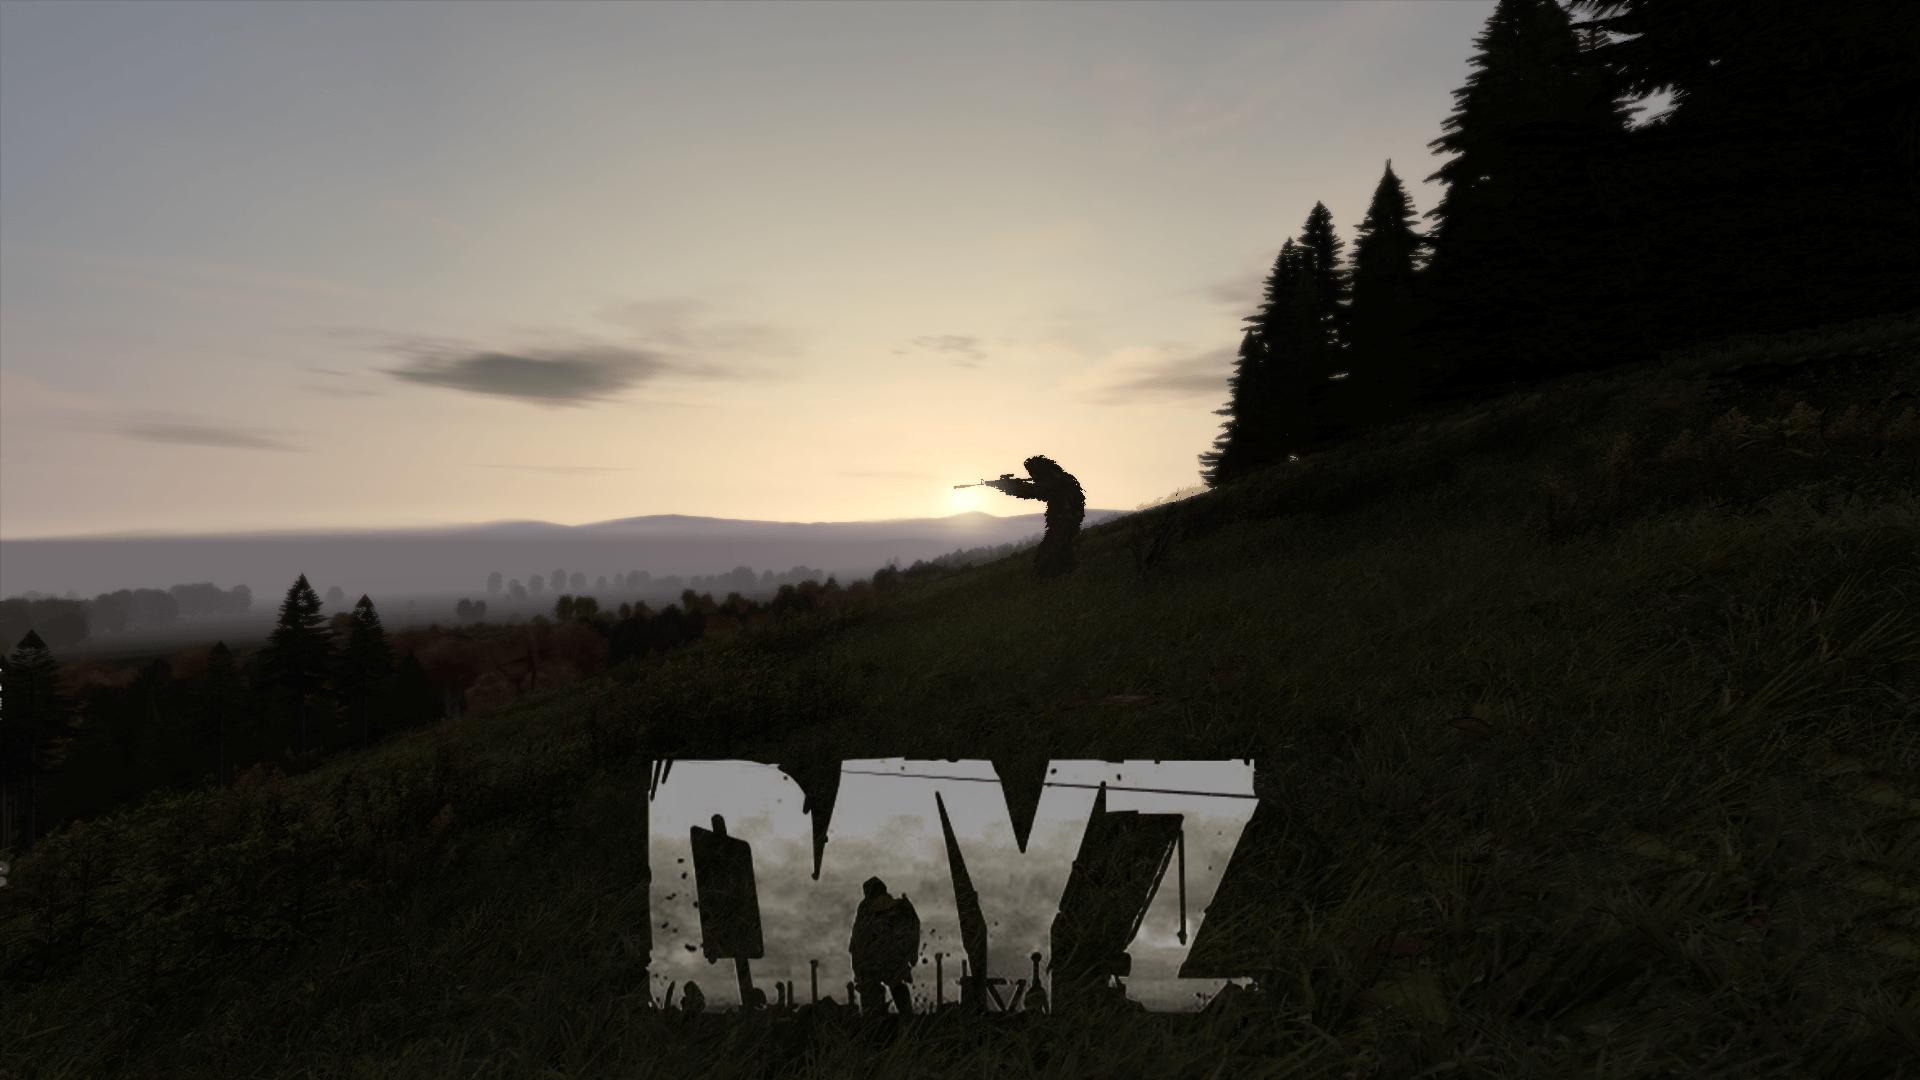 dayz wallpaper 1920x1080